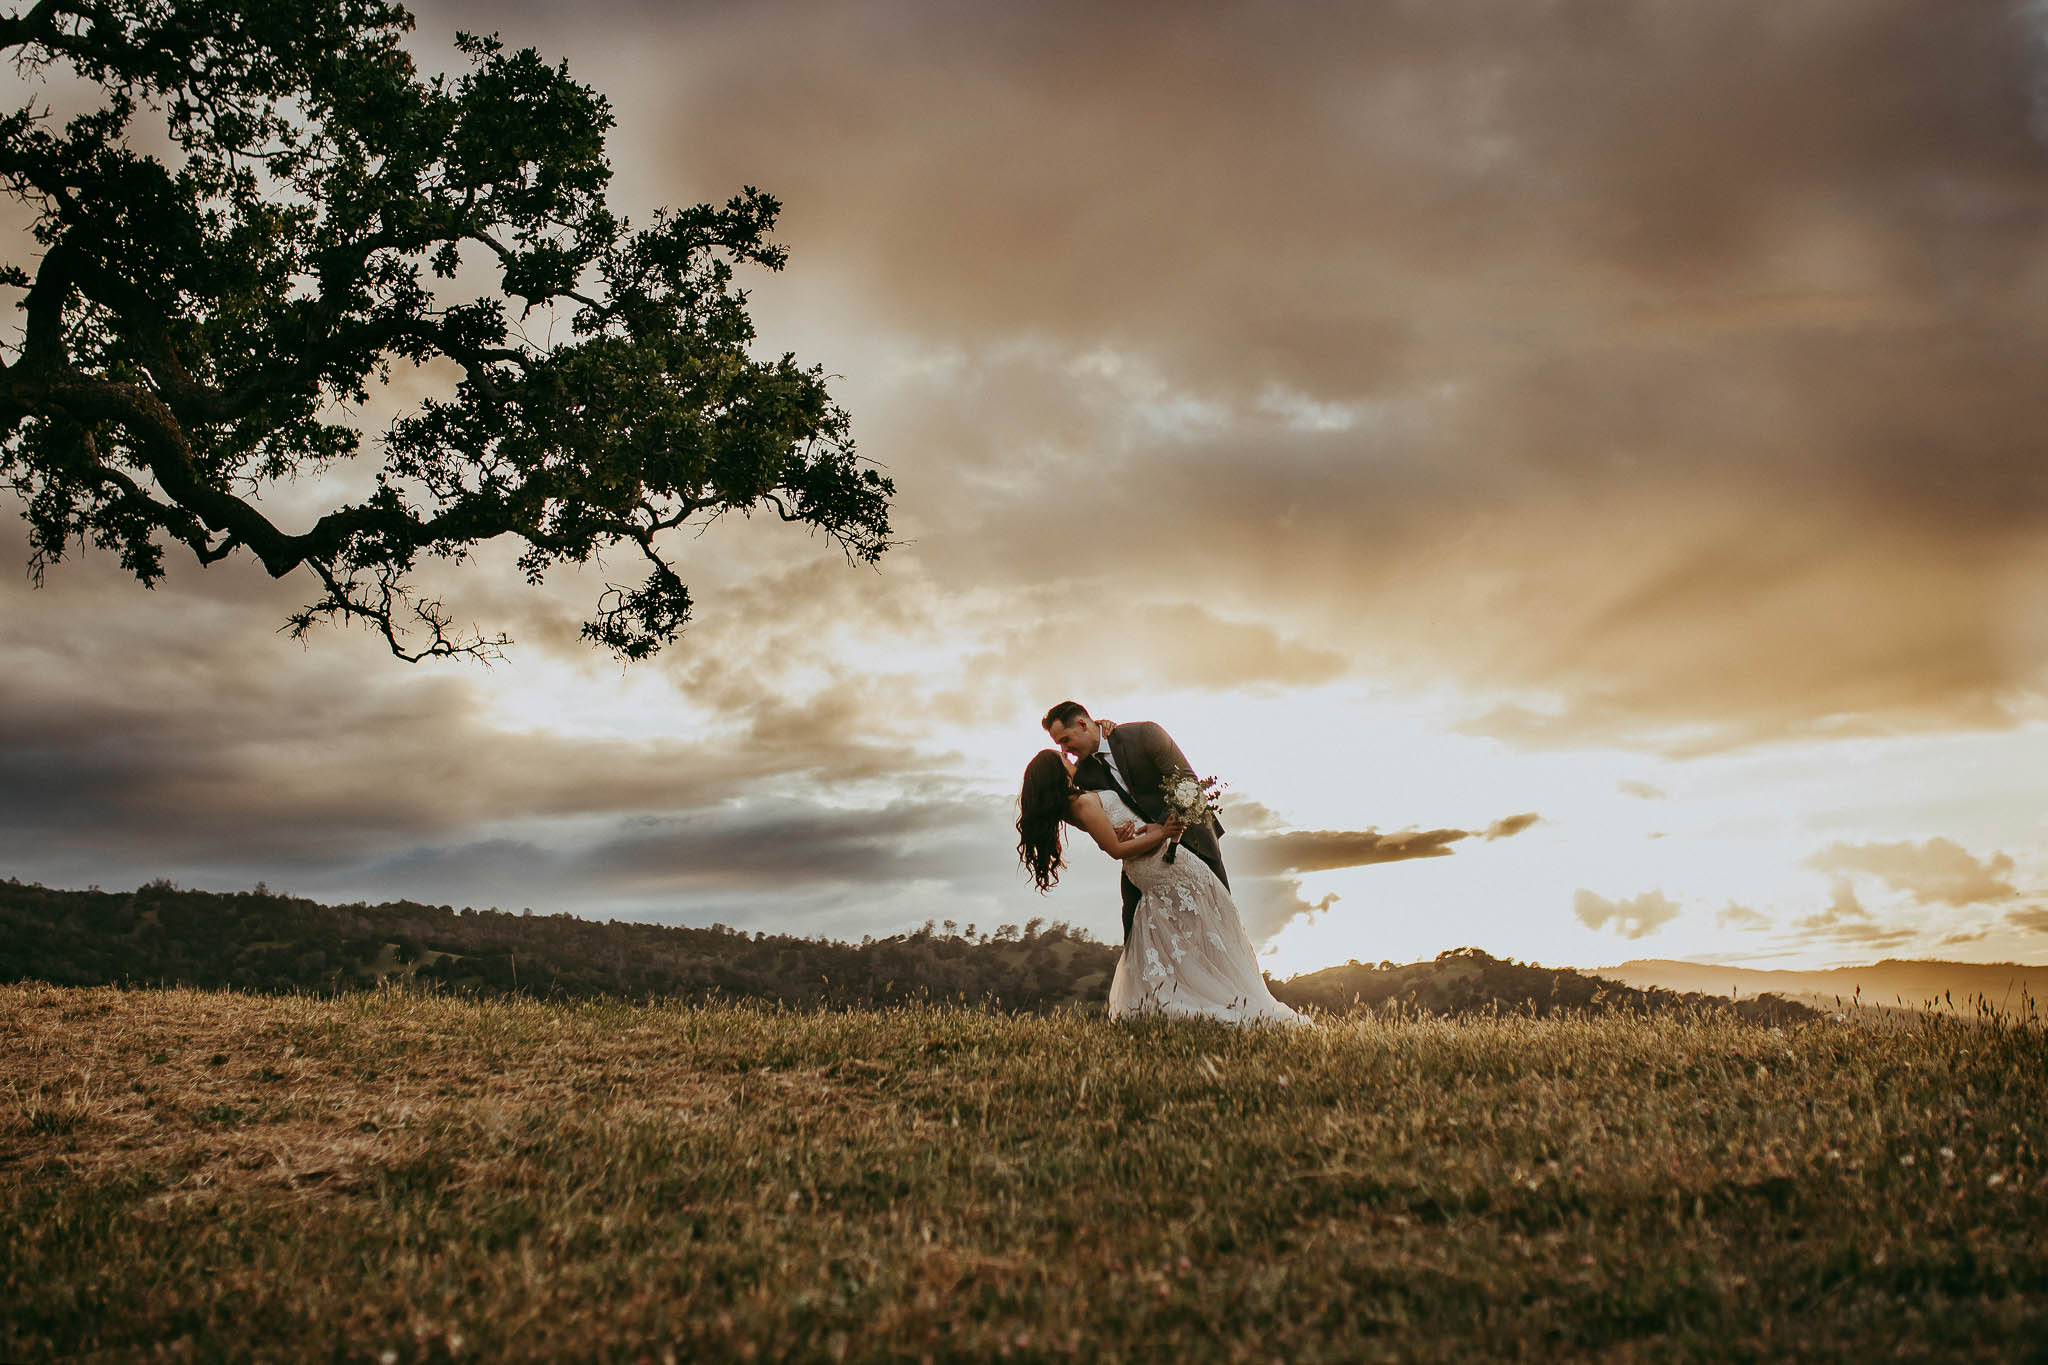 reynolds wed- blog (121 of 174).jpg